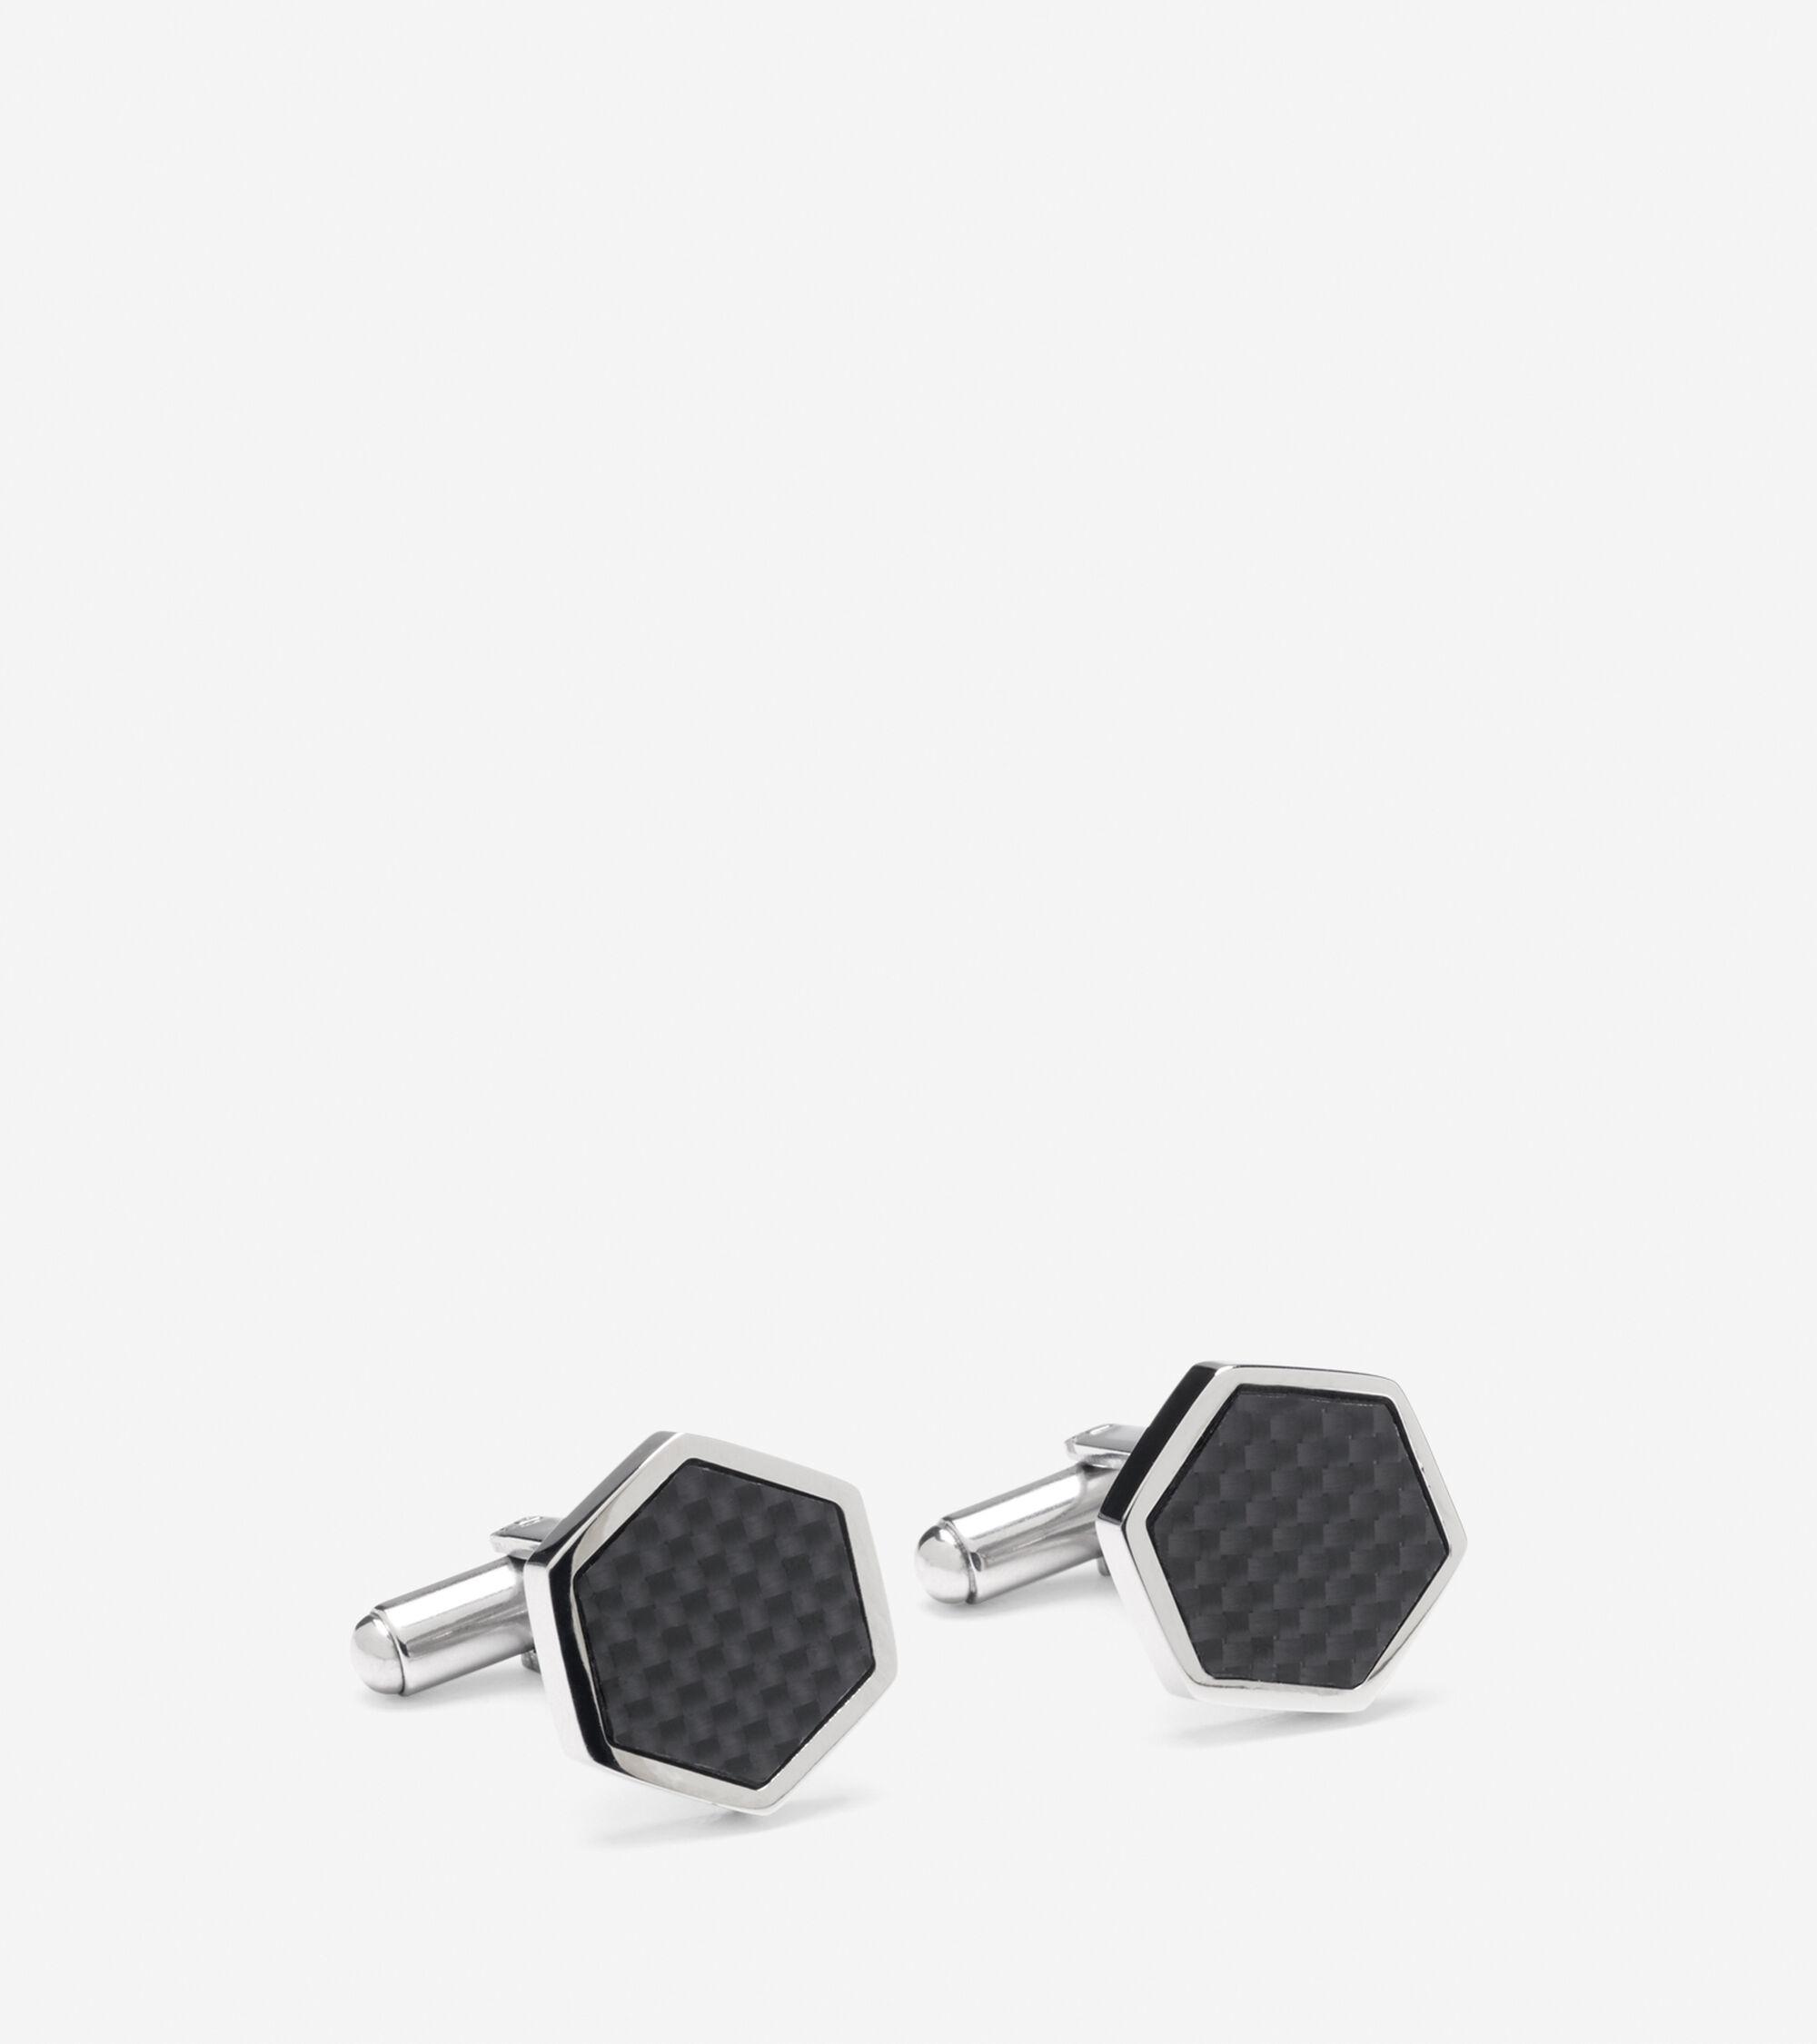 Accessories > Carbon Fiber Cuff Links